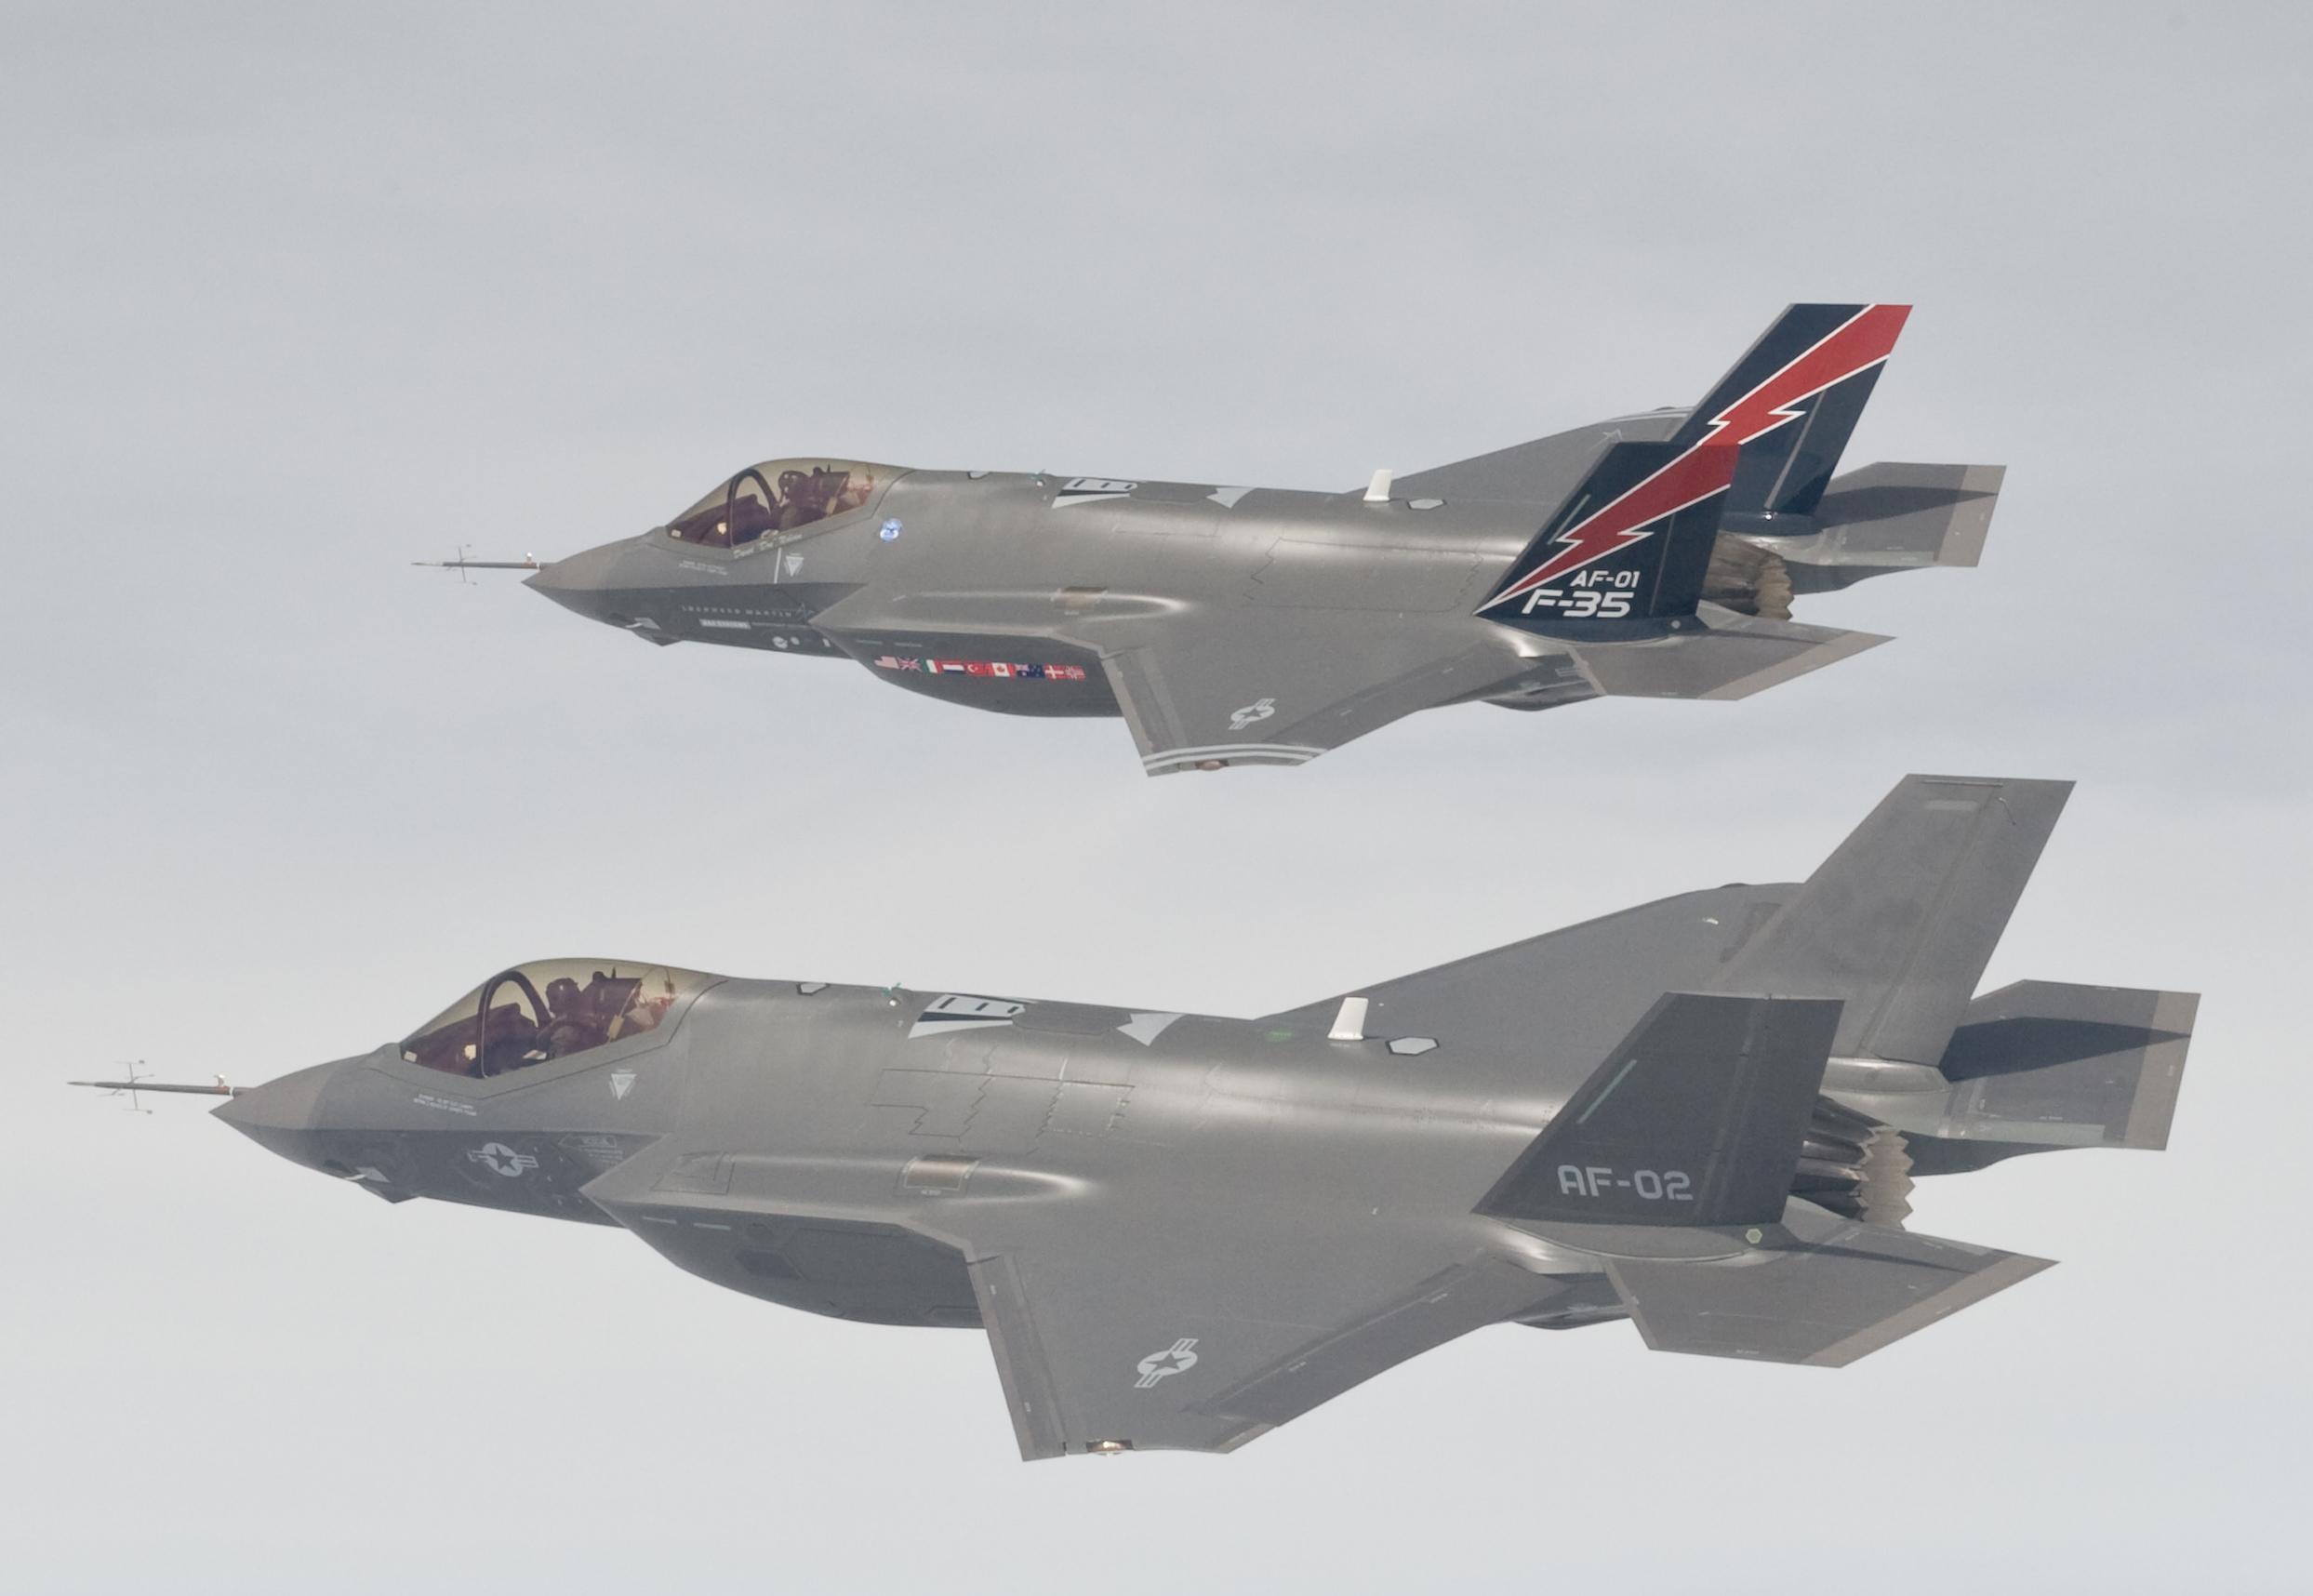 t50/pak fa  ليست شبحيه حتى الان بالتحليل والصور والمصادر  - صفحة 2 F-35_JSF_6